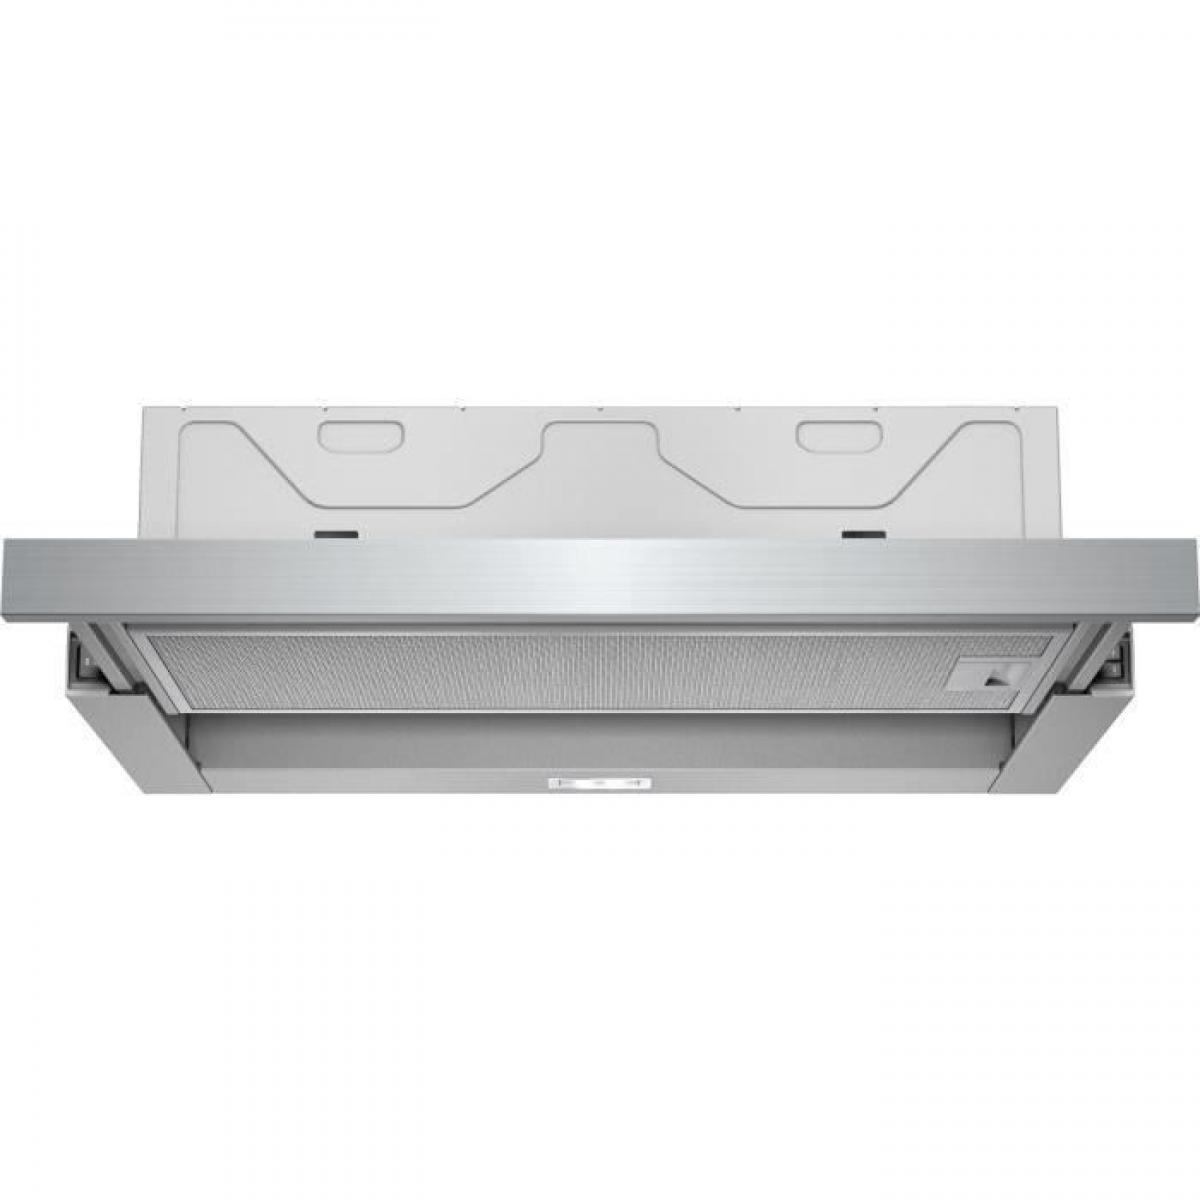 Siemens Hotte tiroir 400m³/h SIEMENS 60cm B, SIE4242003717868